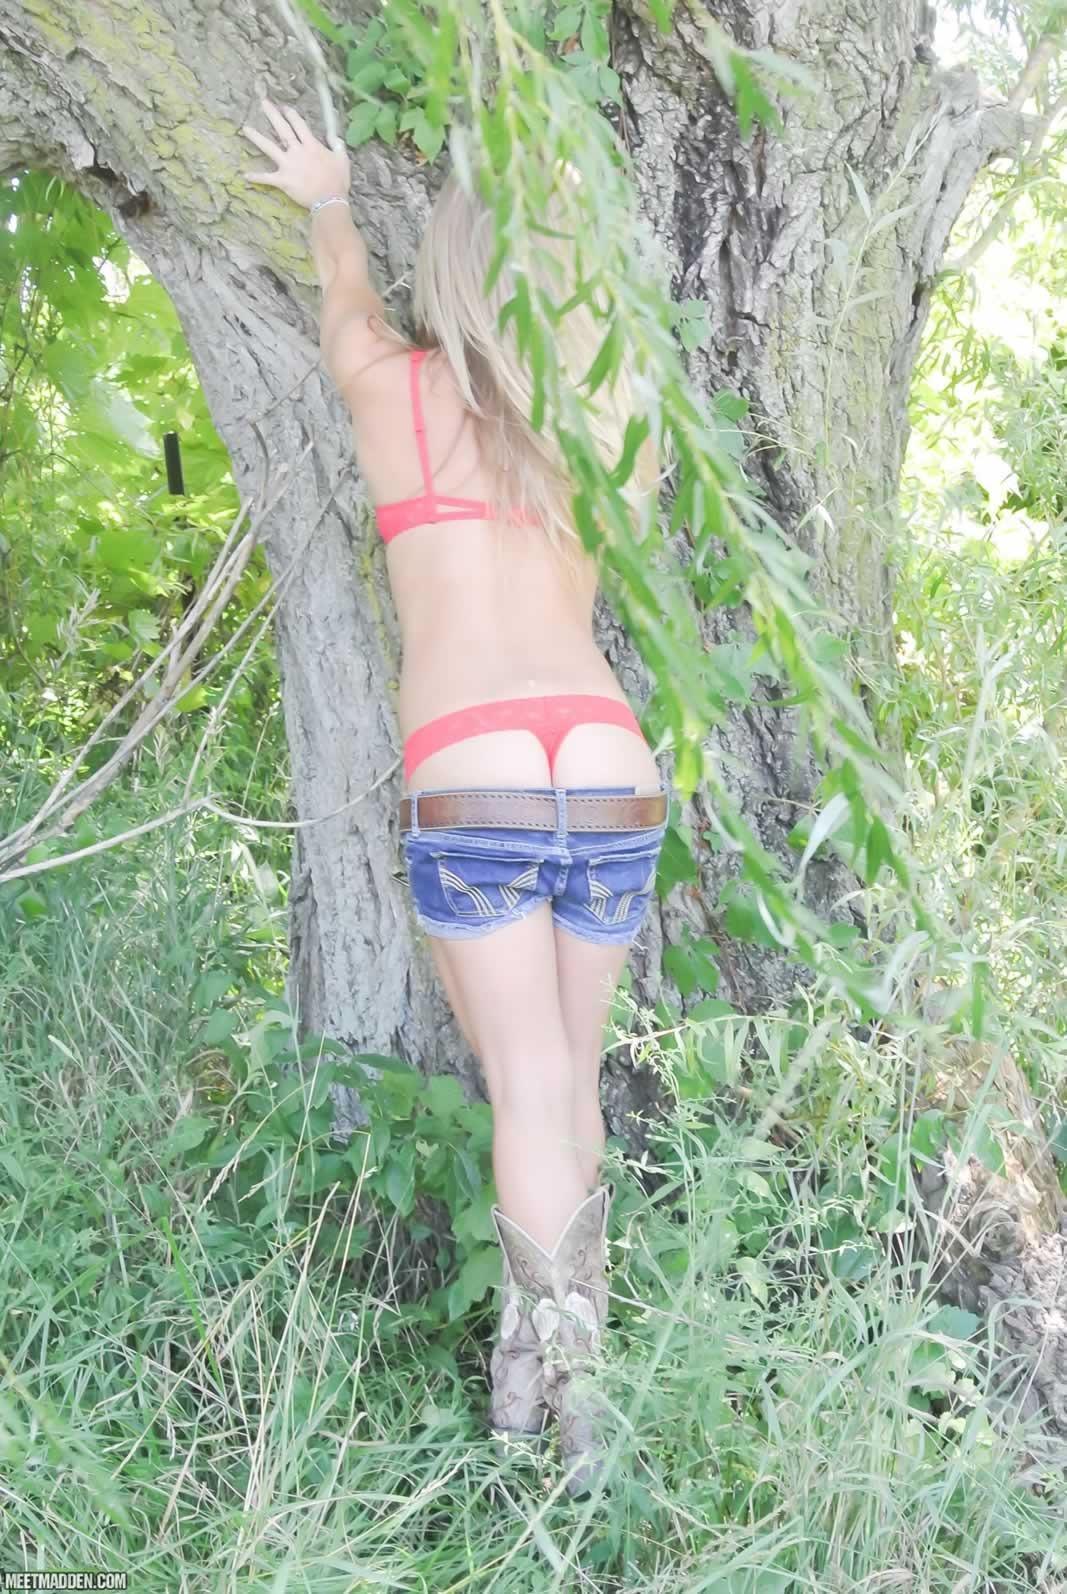 meet country girl single